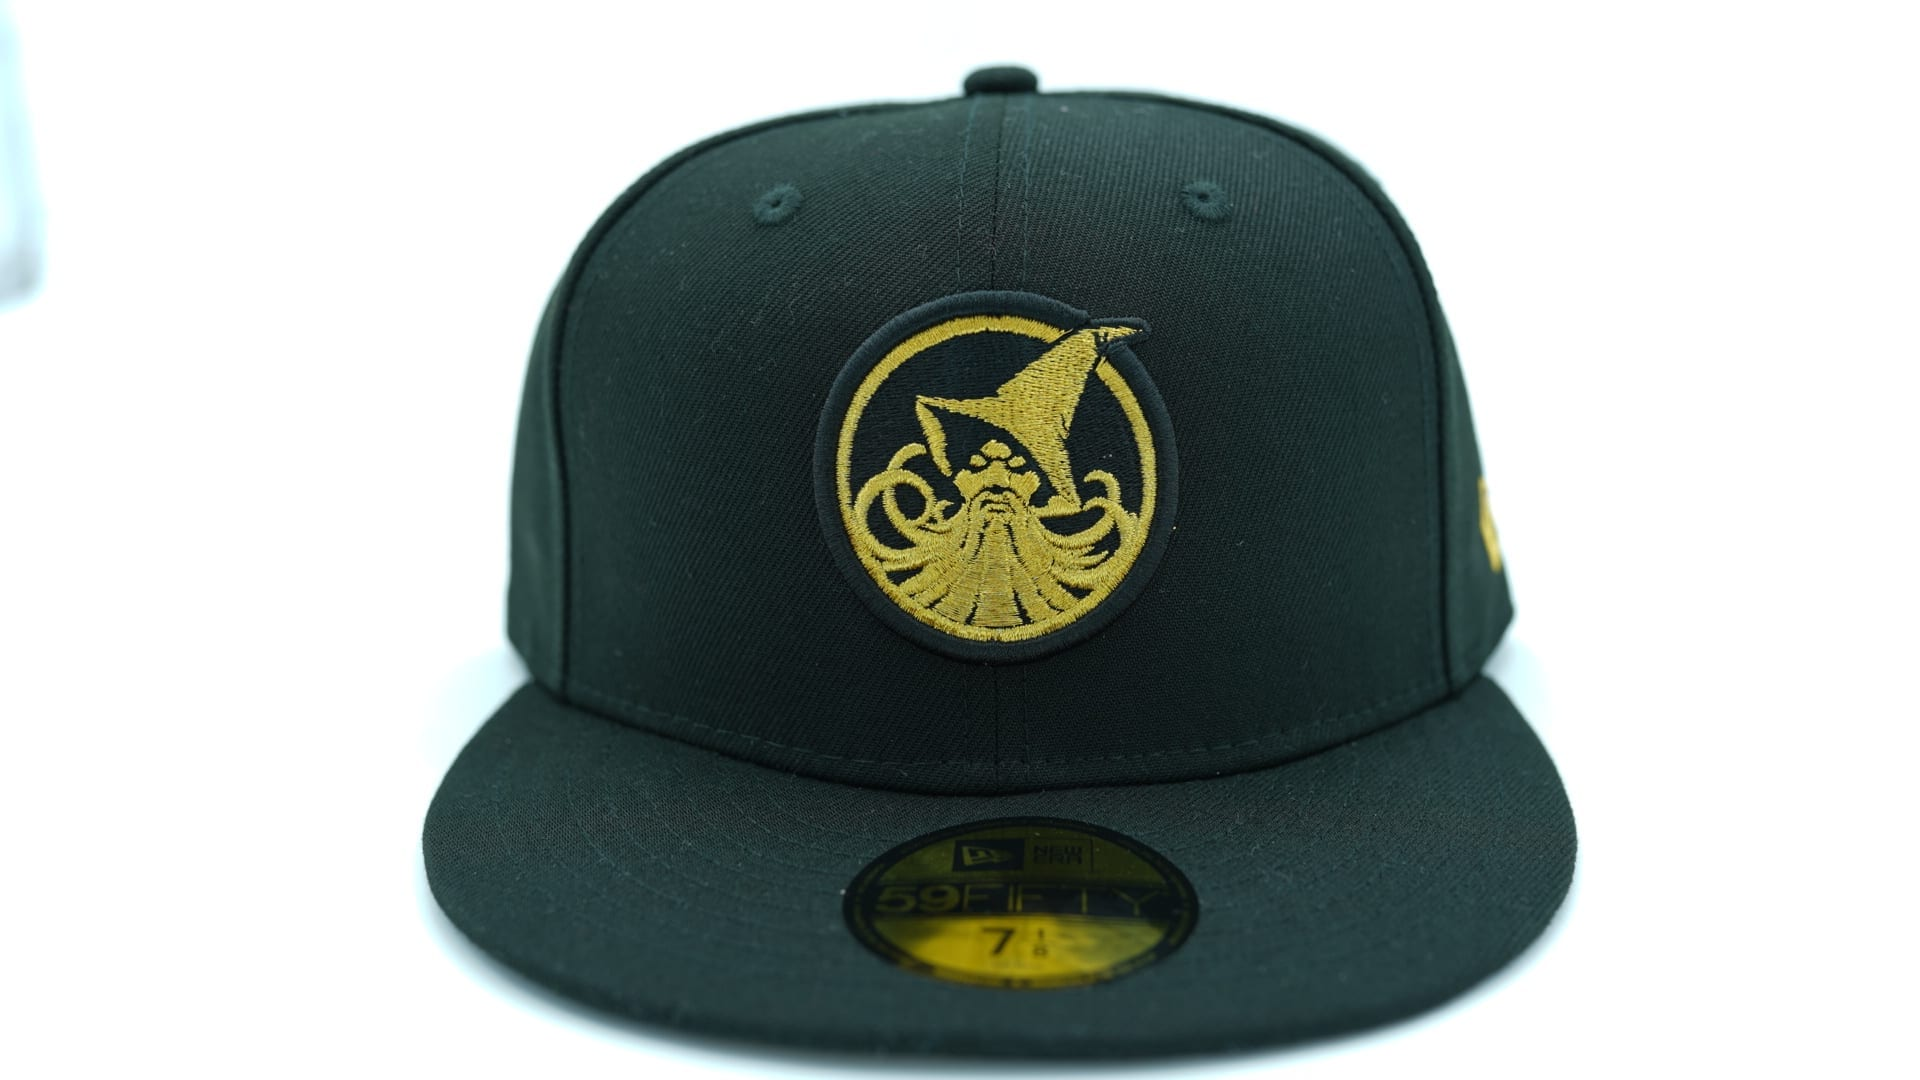 los angeles kings script satin basic black 59fifty fitted baseball cap new era nhl